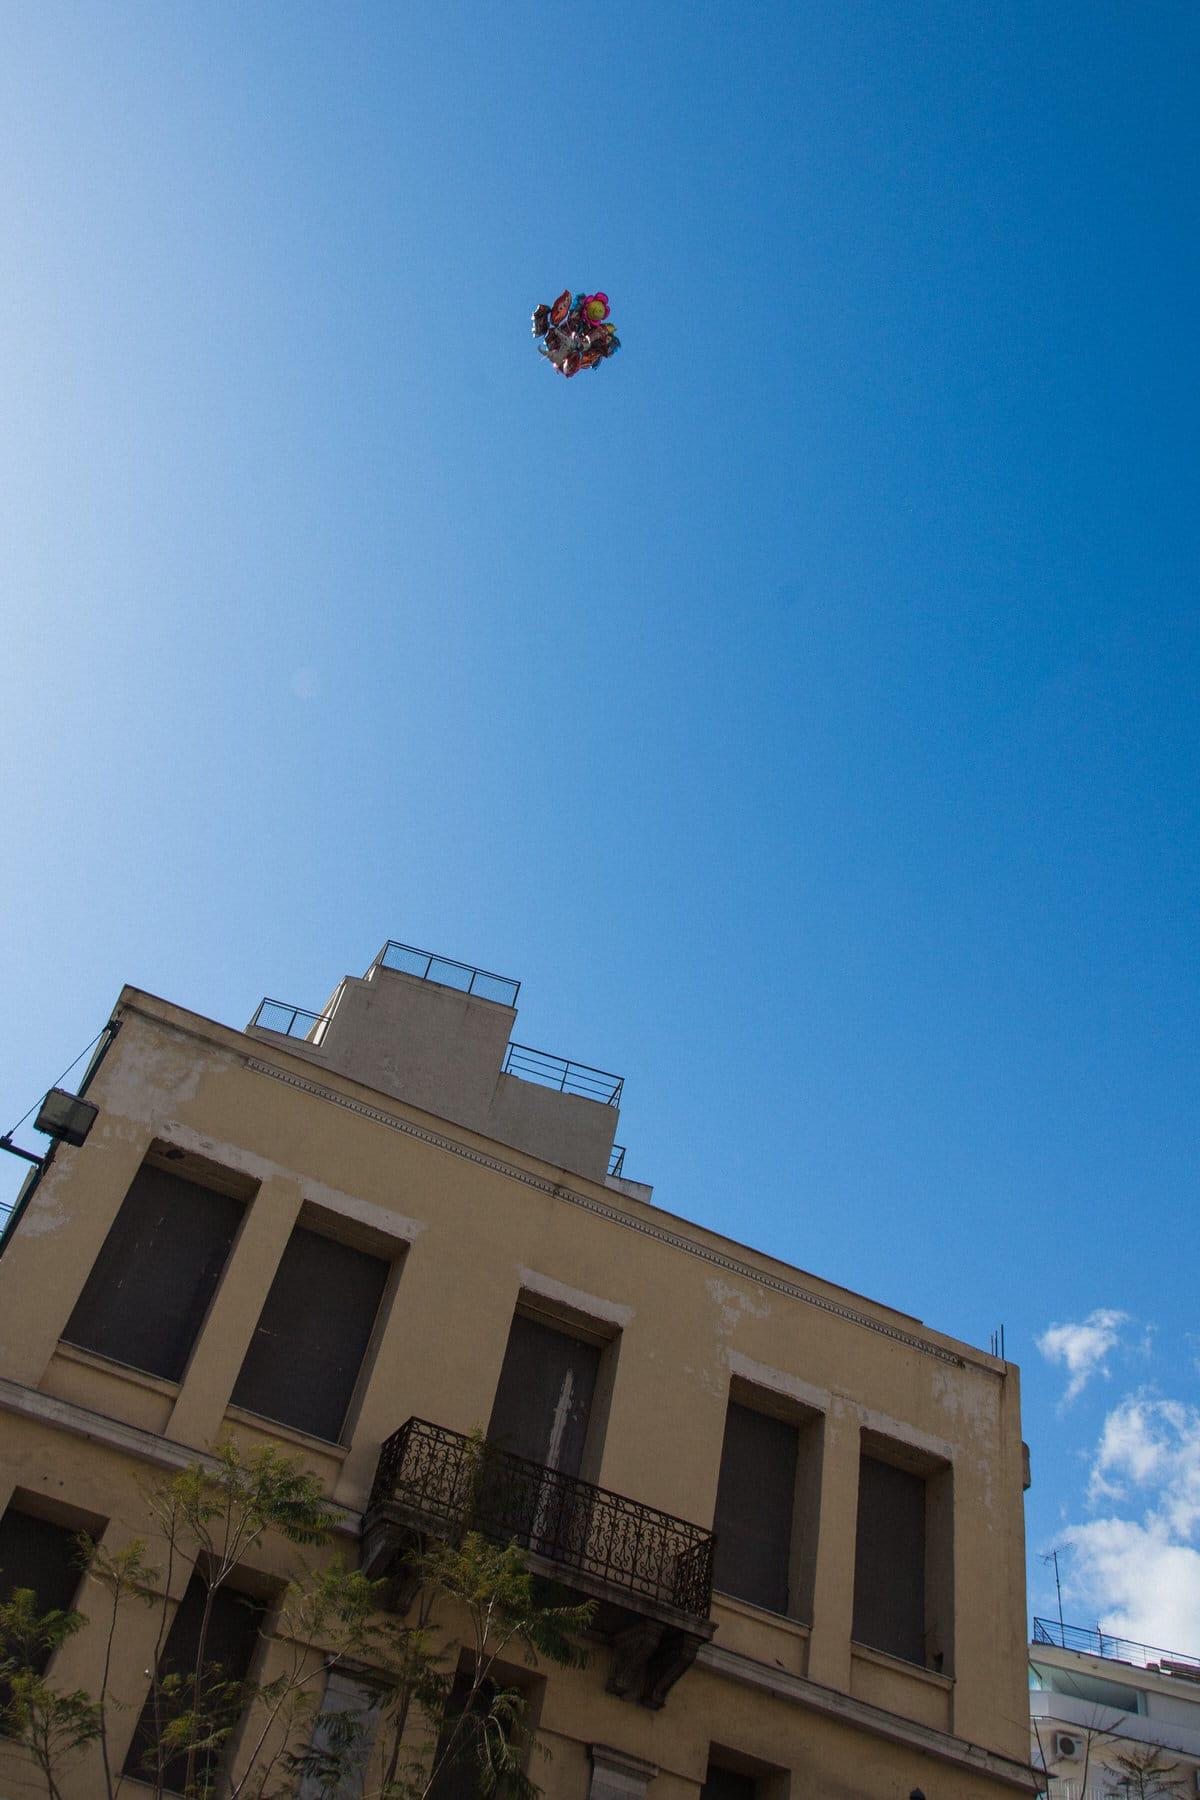 Athens-Greece-fine-art-photography-by-Studio-L-photographer-Laura-Schneider-_2147